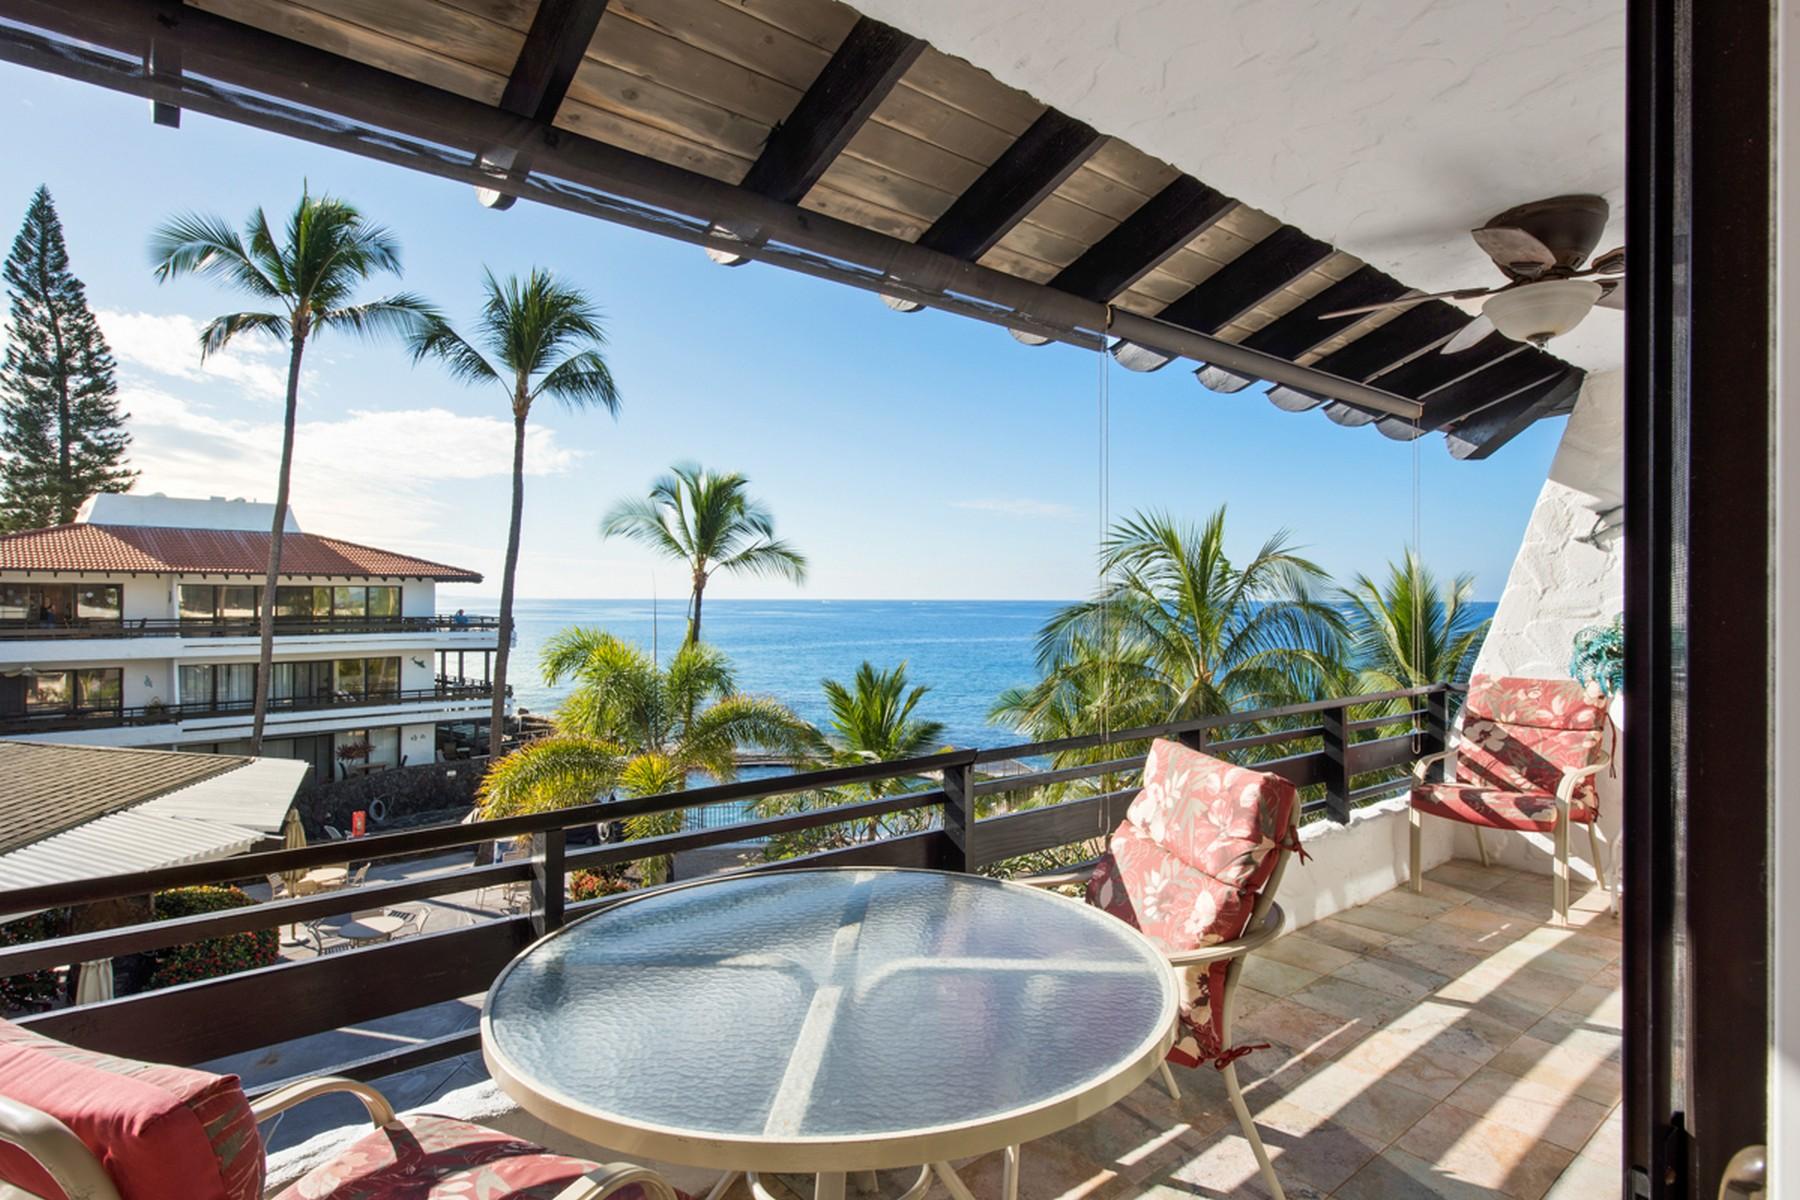 Condominium for Sale at Casa de Emdeko 75-6082 Alii Dr. B336, Kailua-Kona, Hawaii, 96740 United States